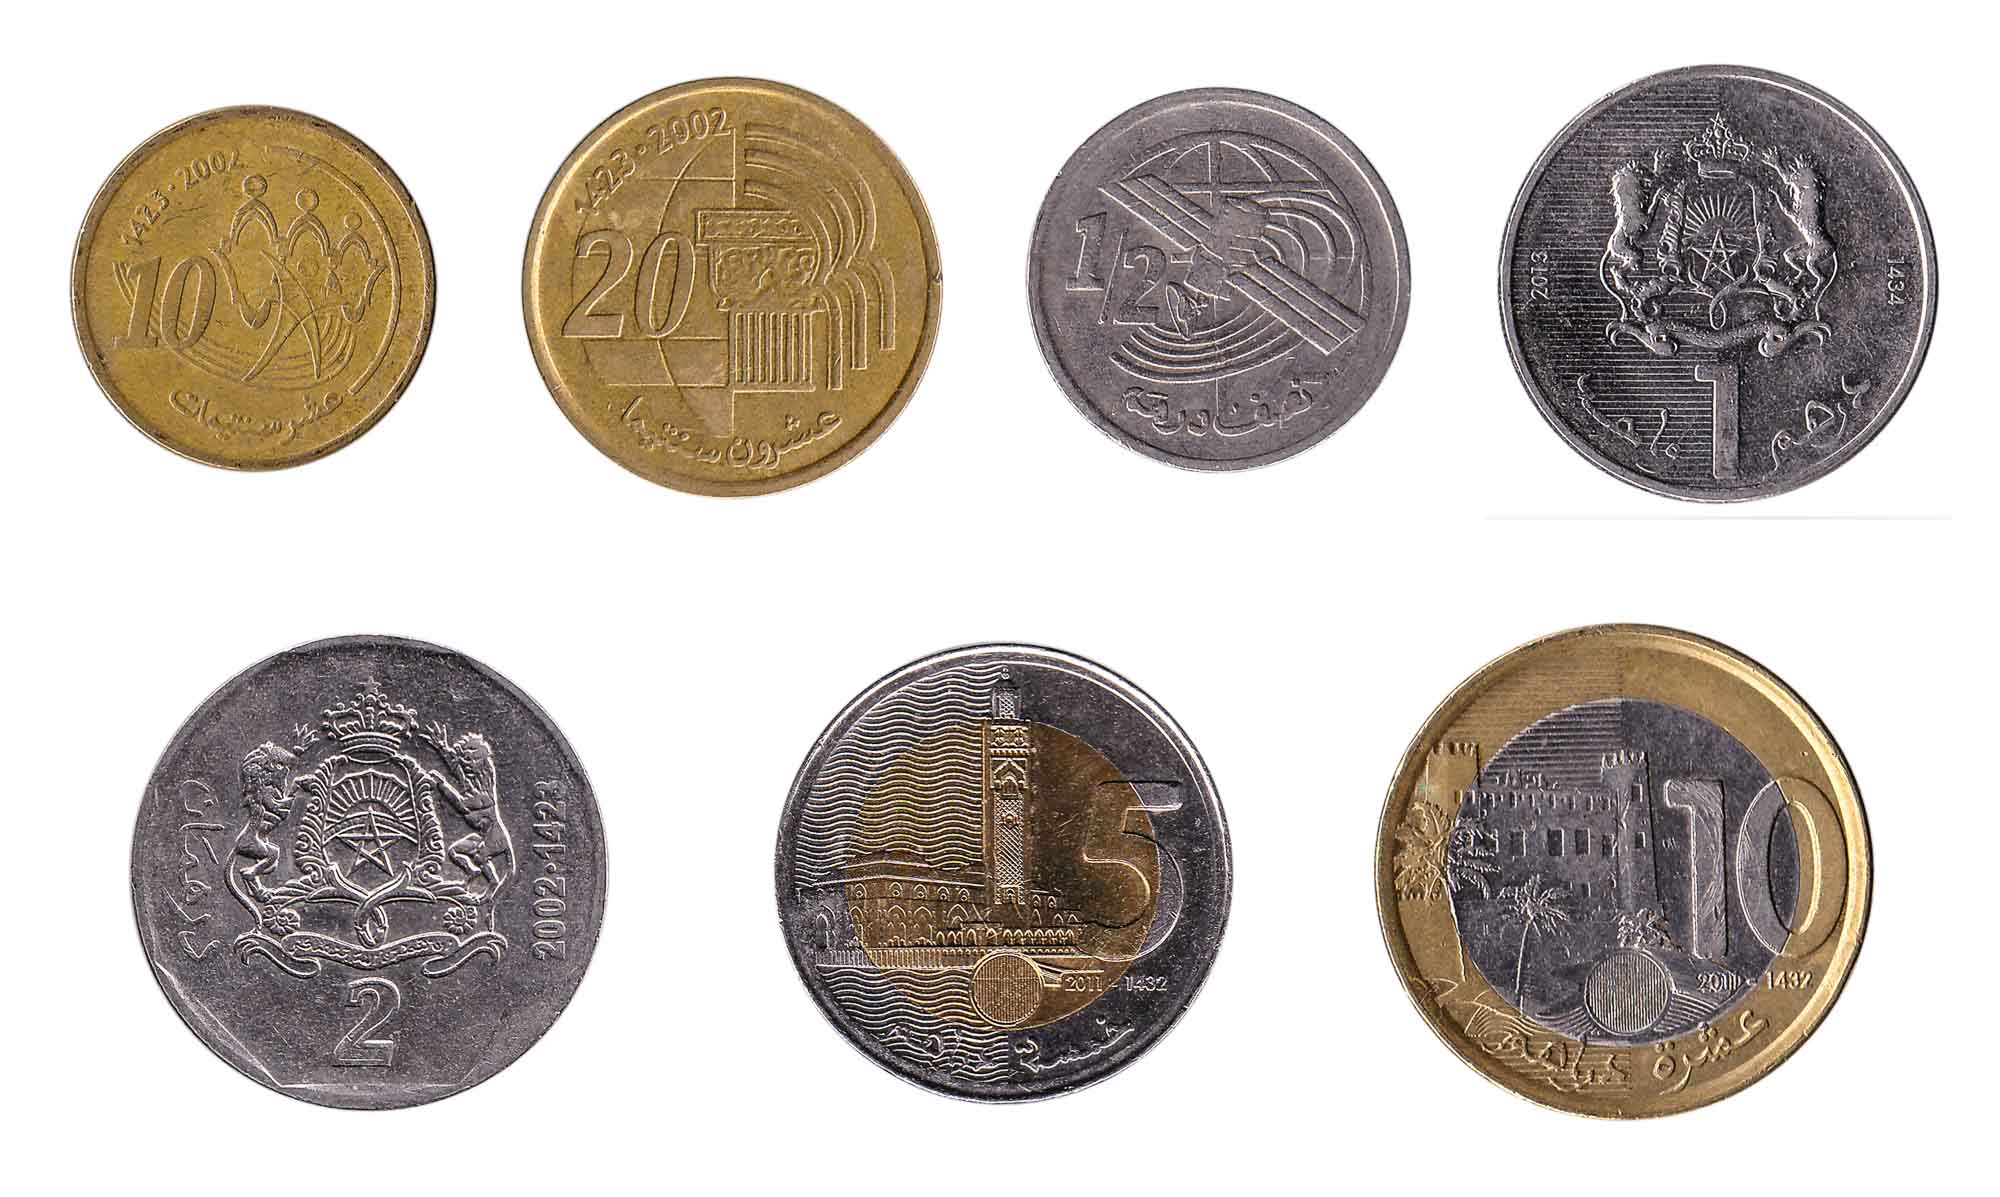 Moroccan dirham coins